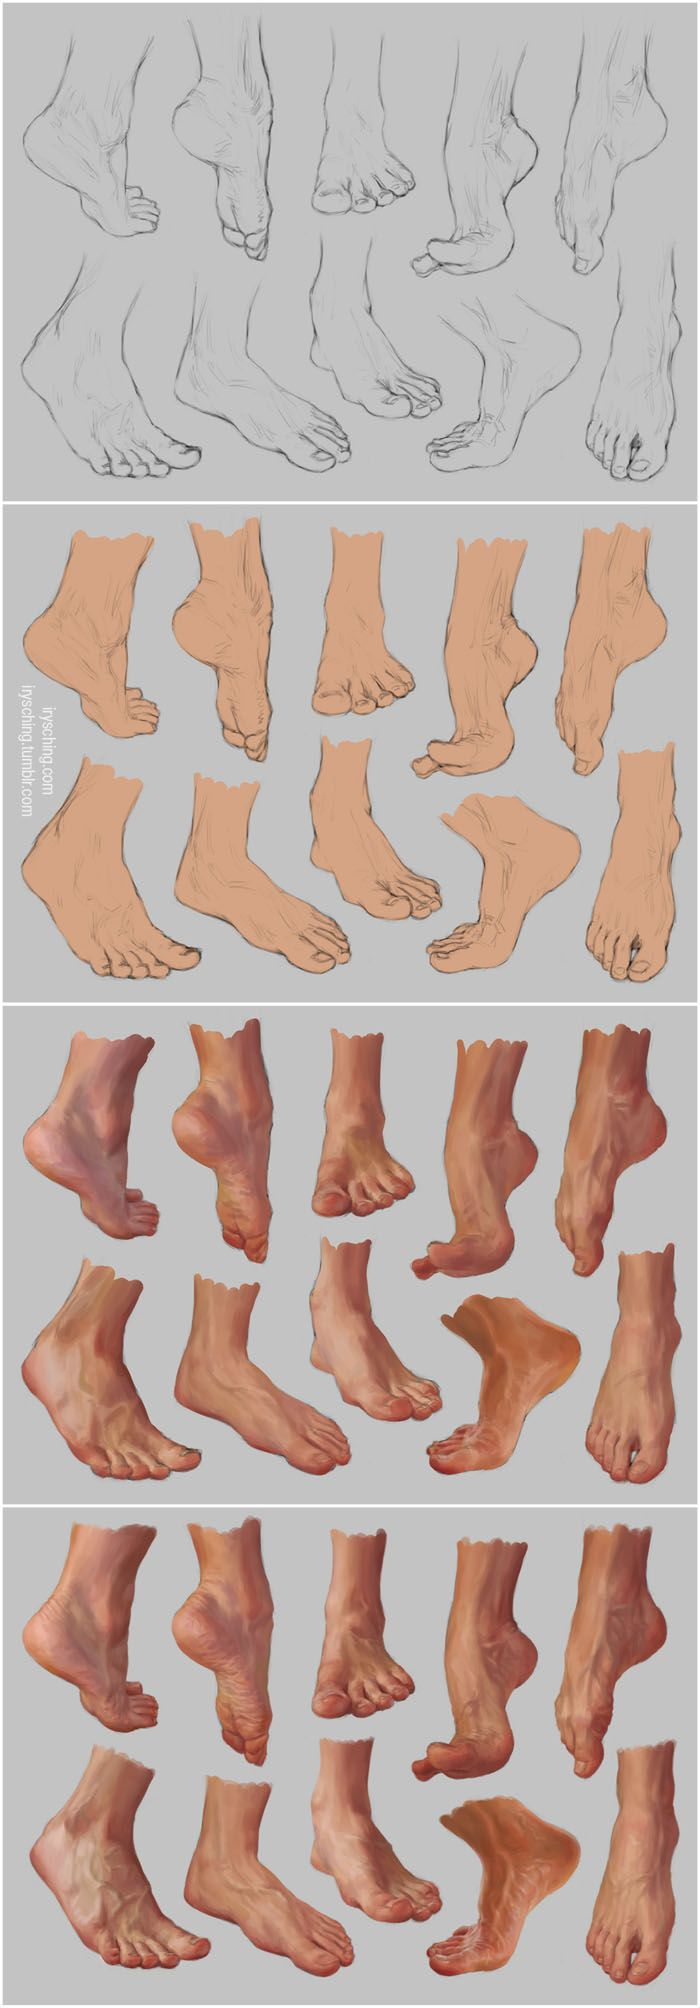 Feet Study 2 Steps by ~irysching on deviantART join us http://pinterest.com/koztar/cg-anatomy-tutorials-for-artists/